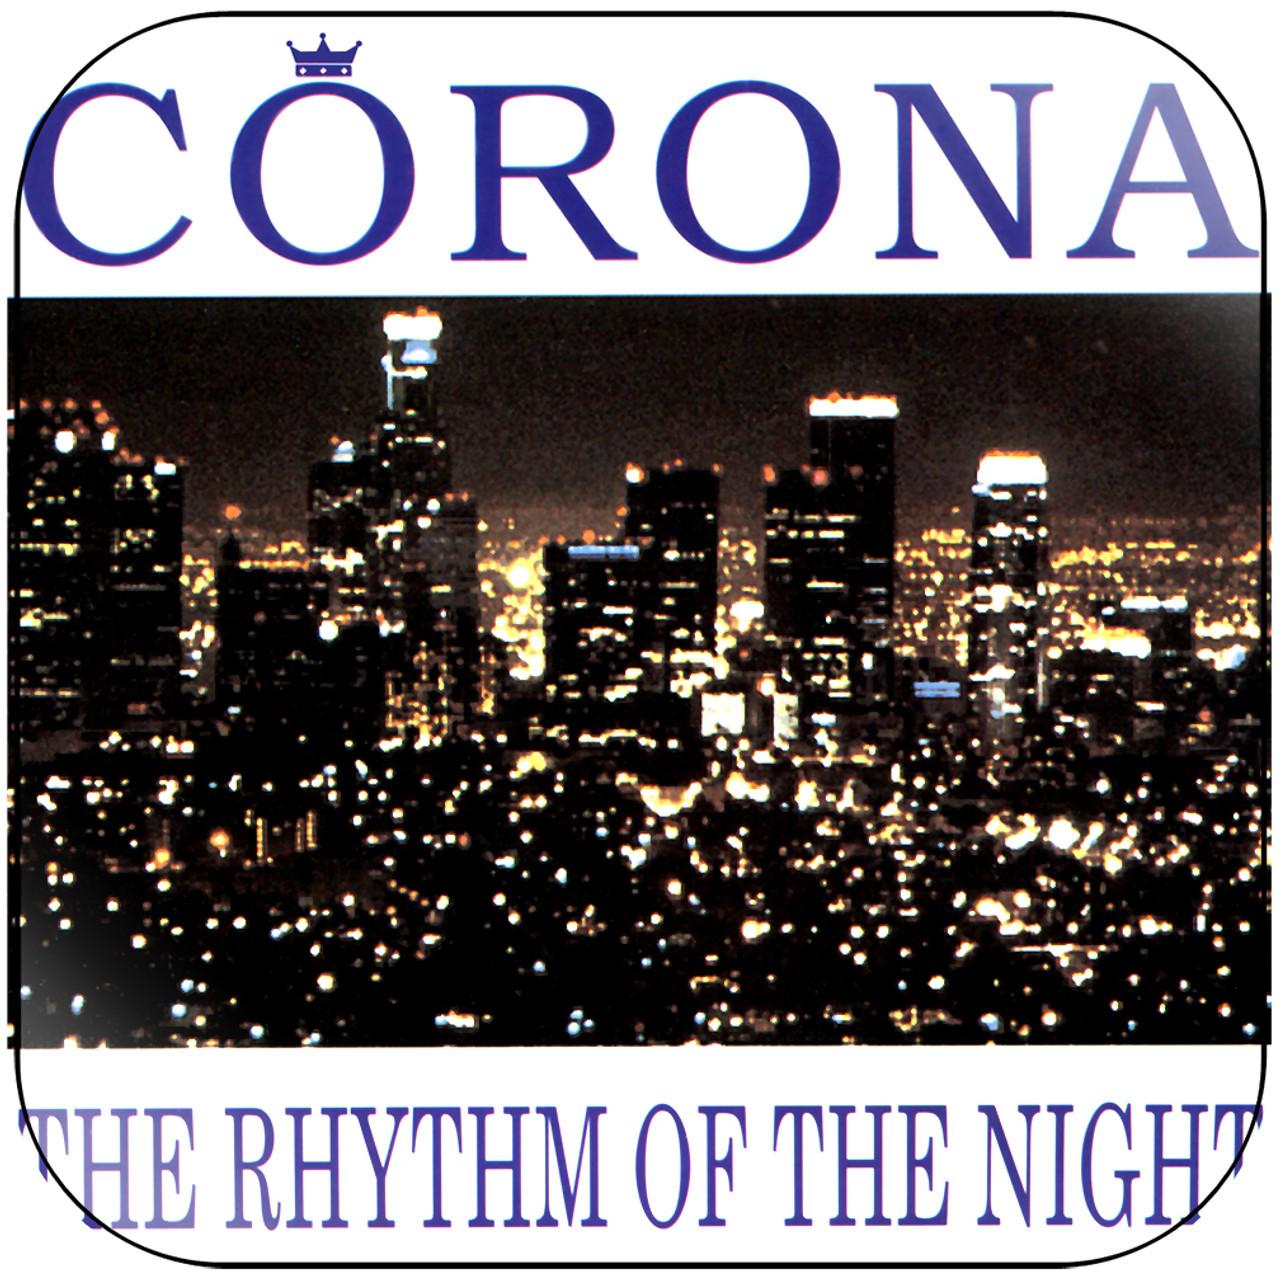 Corona - The Rhythm Of The Night-2 Album Cover Sticker Album Cover Sticker